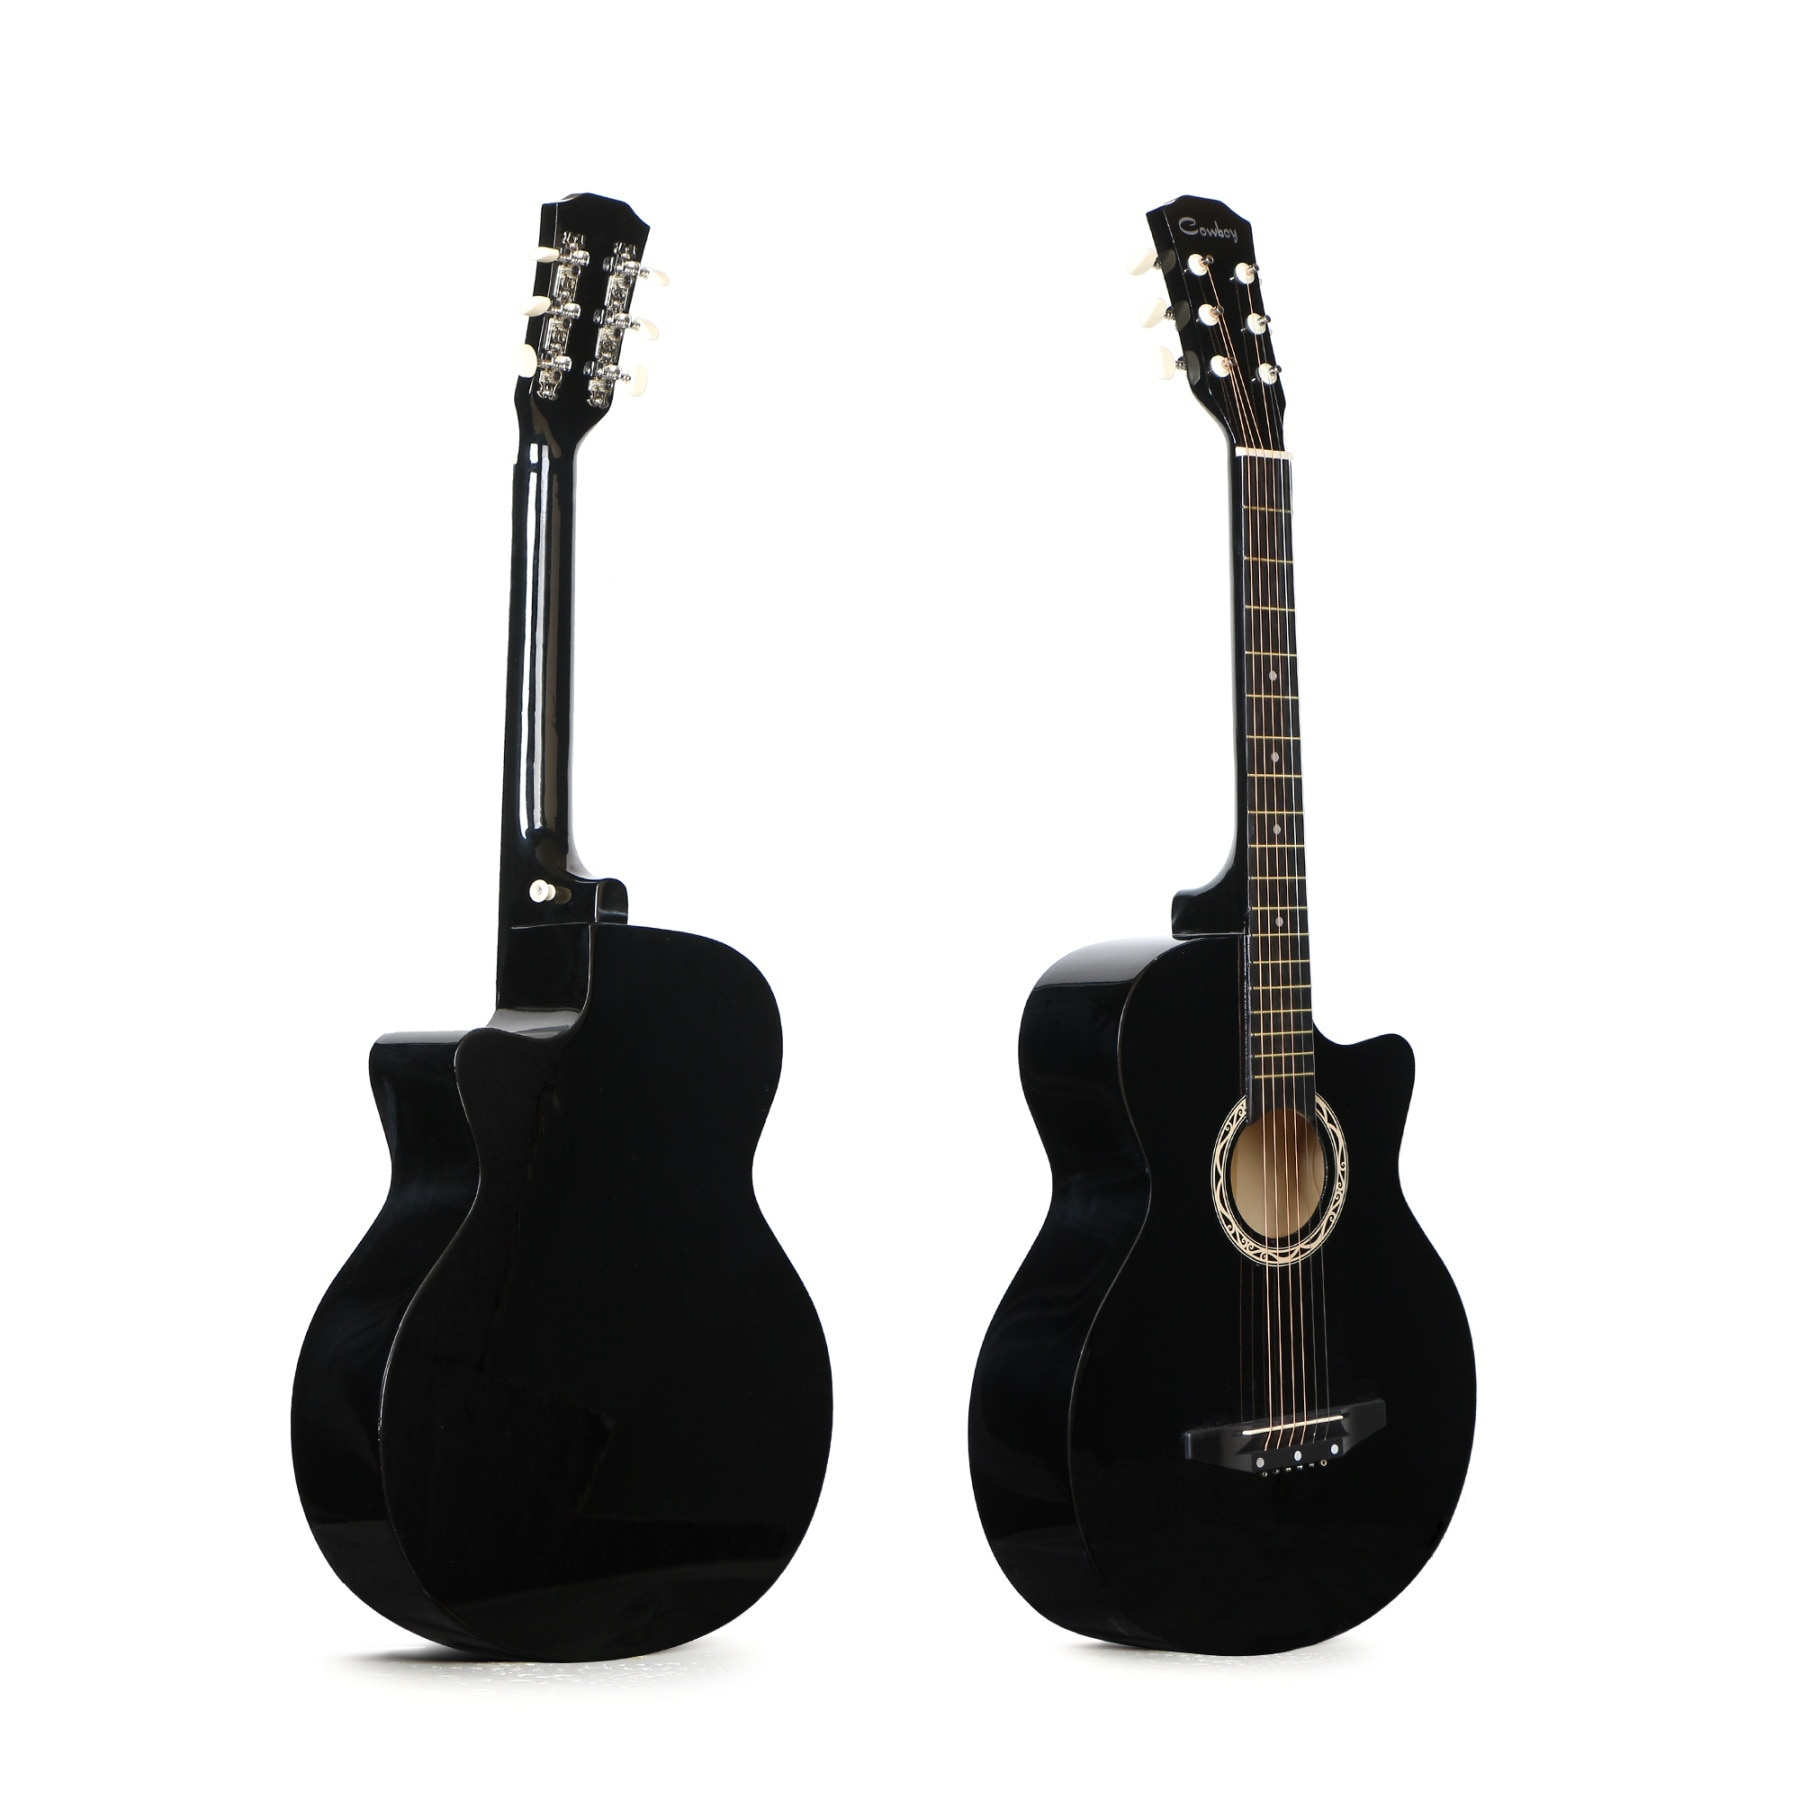 Effect Lead Guitar Tremolo 38 Inch Folk Music Wooden Acoustic Guitar Beginners Instrument Travel Guitare Entertainment HX50JT